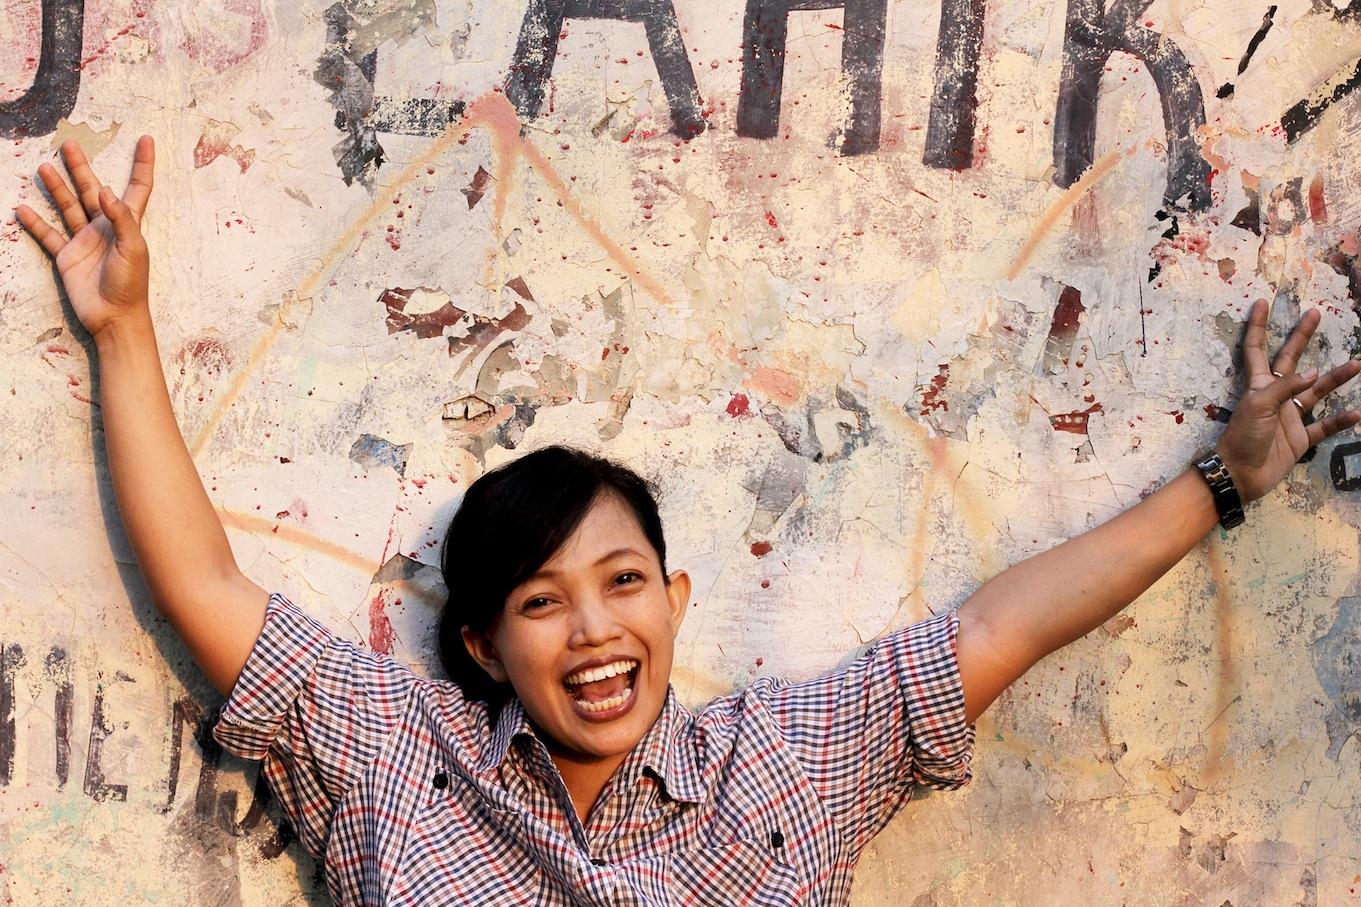 Jakartan kaduilla muusikot etsiv‰t vapautta omaan el‰m‰‰ns‰. O: Daniel Ziv T: DesaKota Productions, Indonesia 2011 HD. Kuvassa Titi Juwariyah. Yle Kuvapalvelu